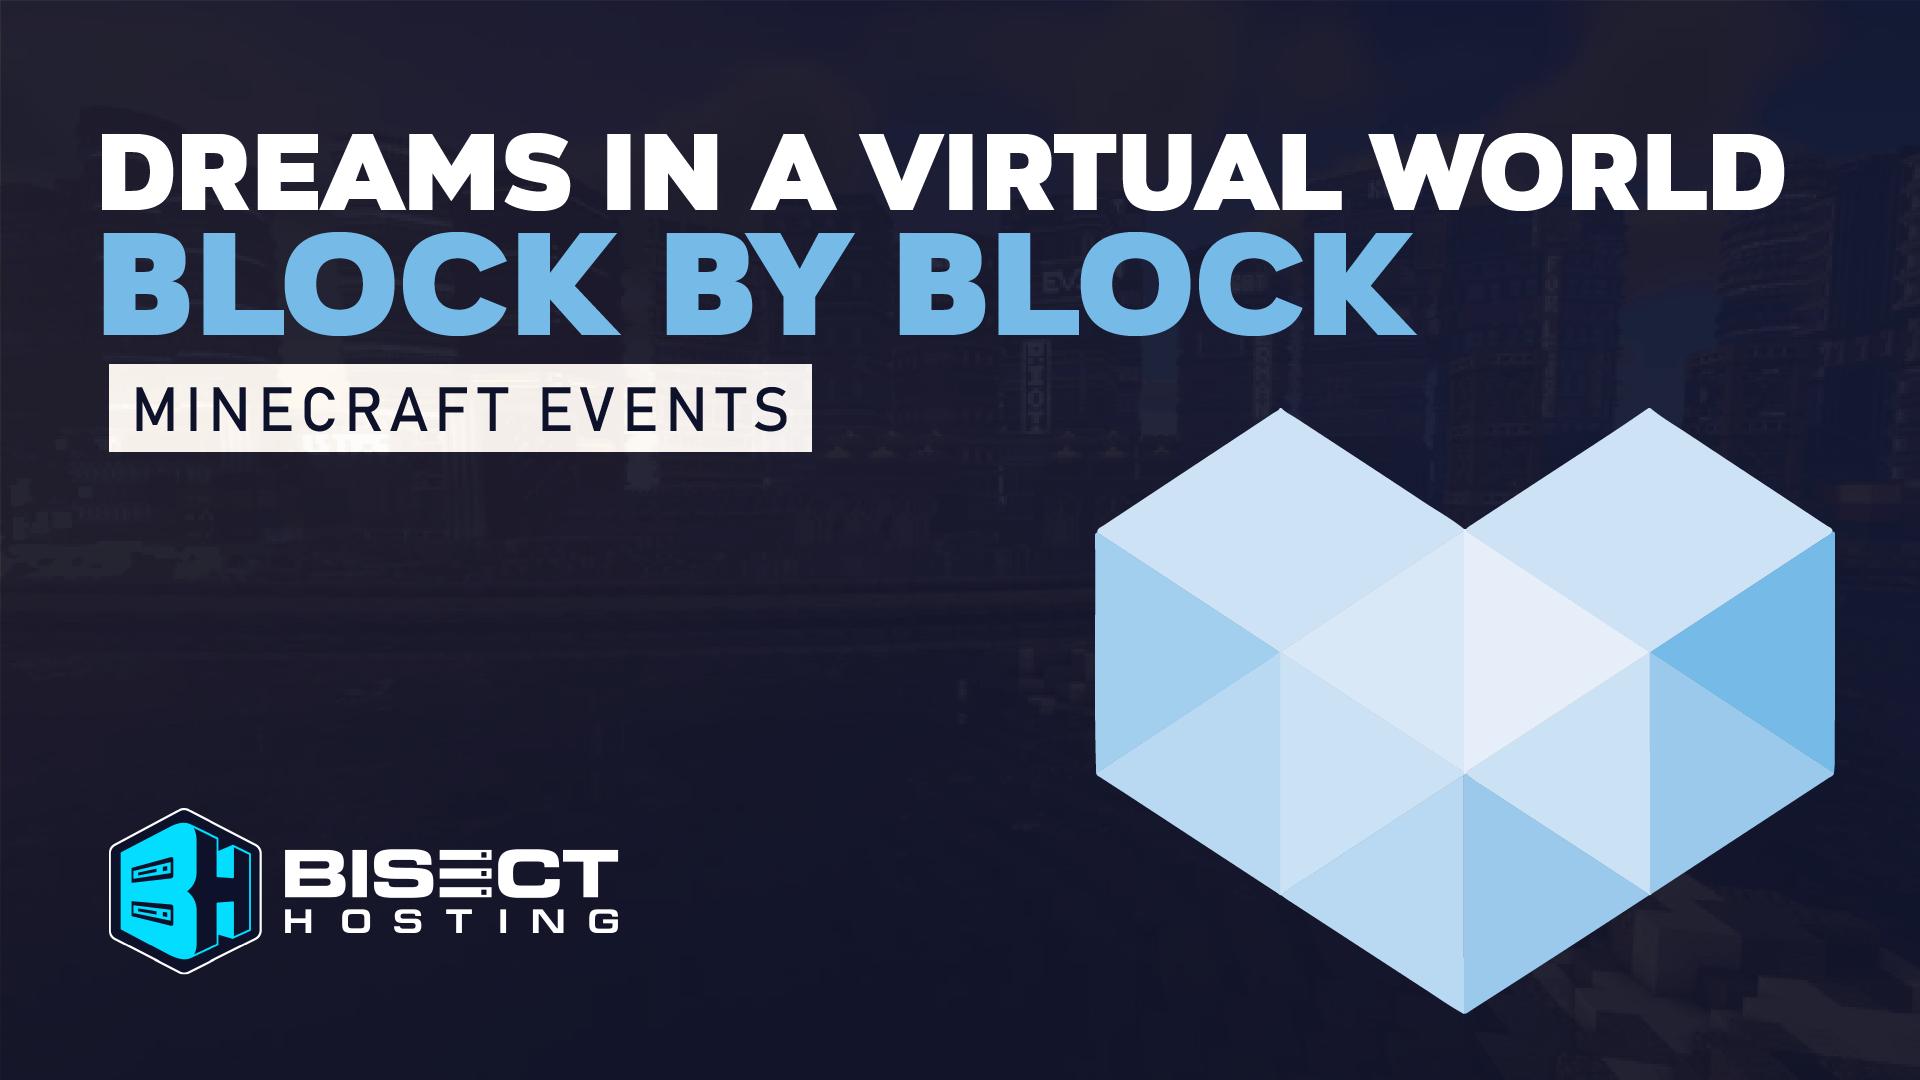 Dreams in a Virtual World: Block by Block